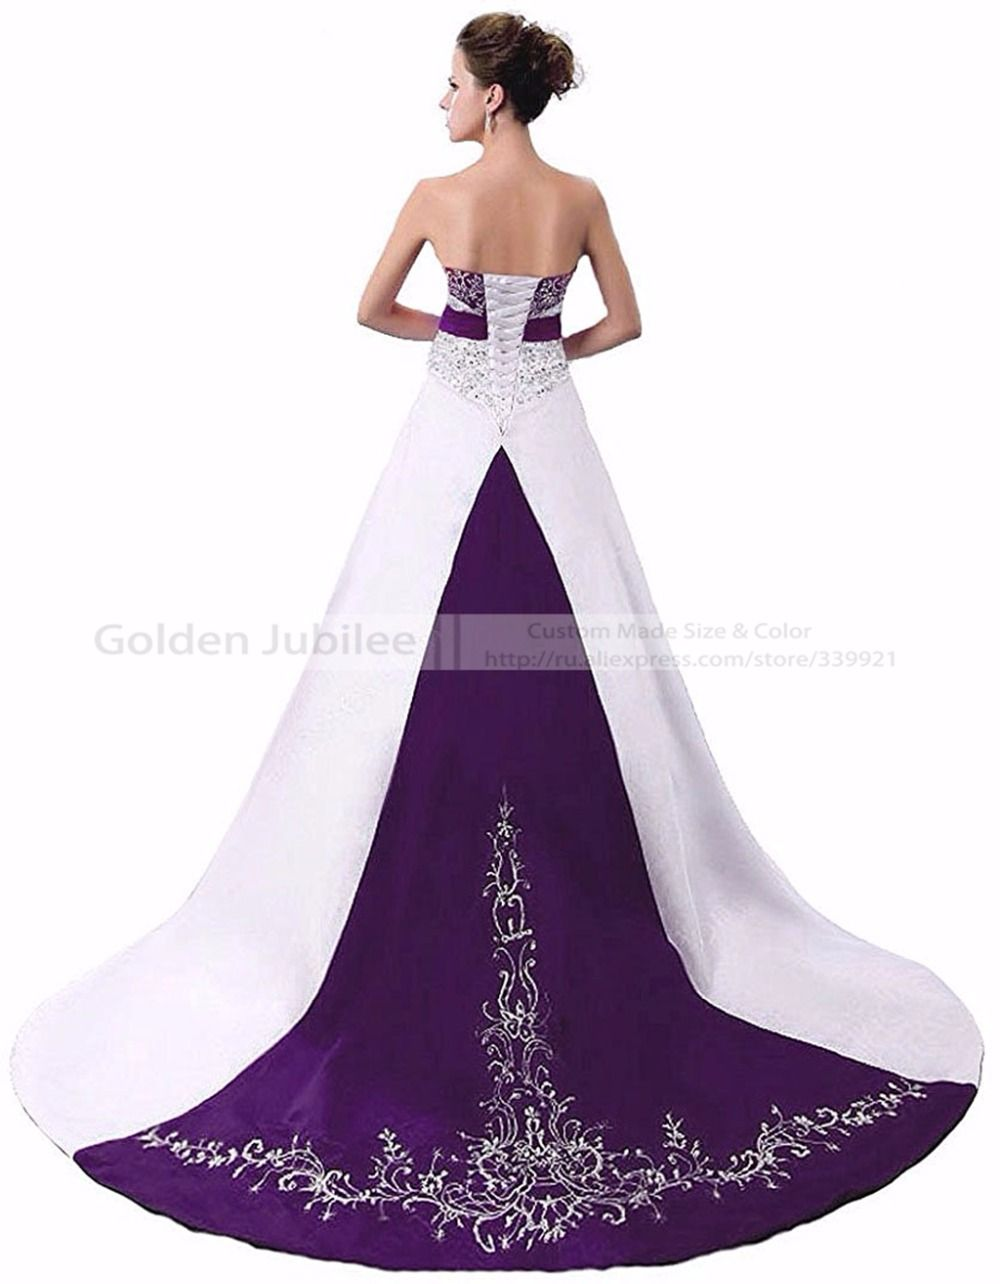 2016 Elegant Embroidery Vintage Floor Length Gown Purple Black Red Satin Beaded Vestidos De Novia 2016 Wedding Dresses 2017